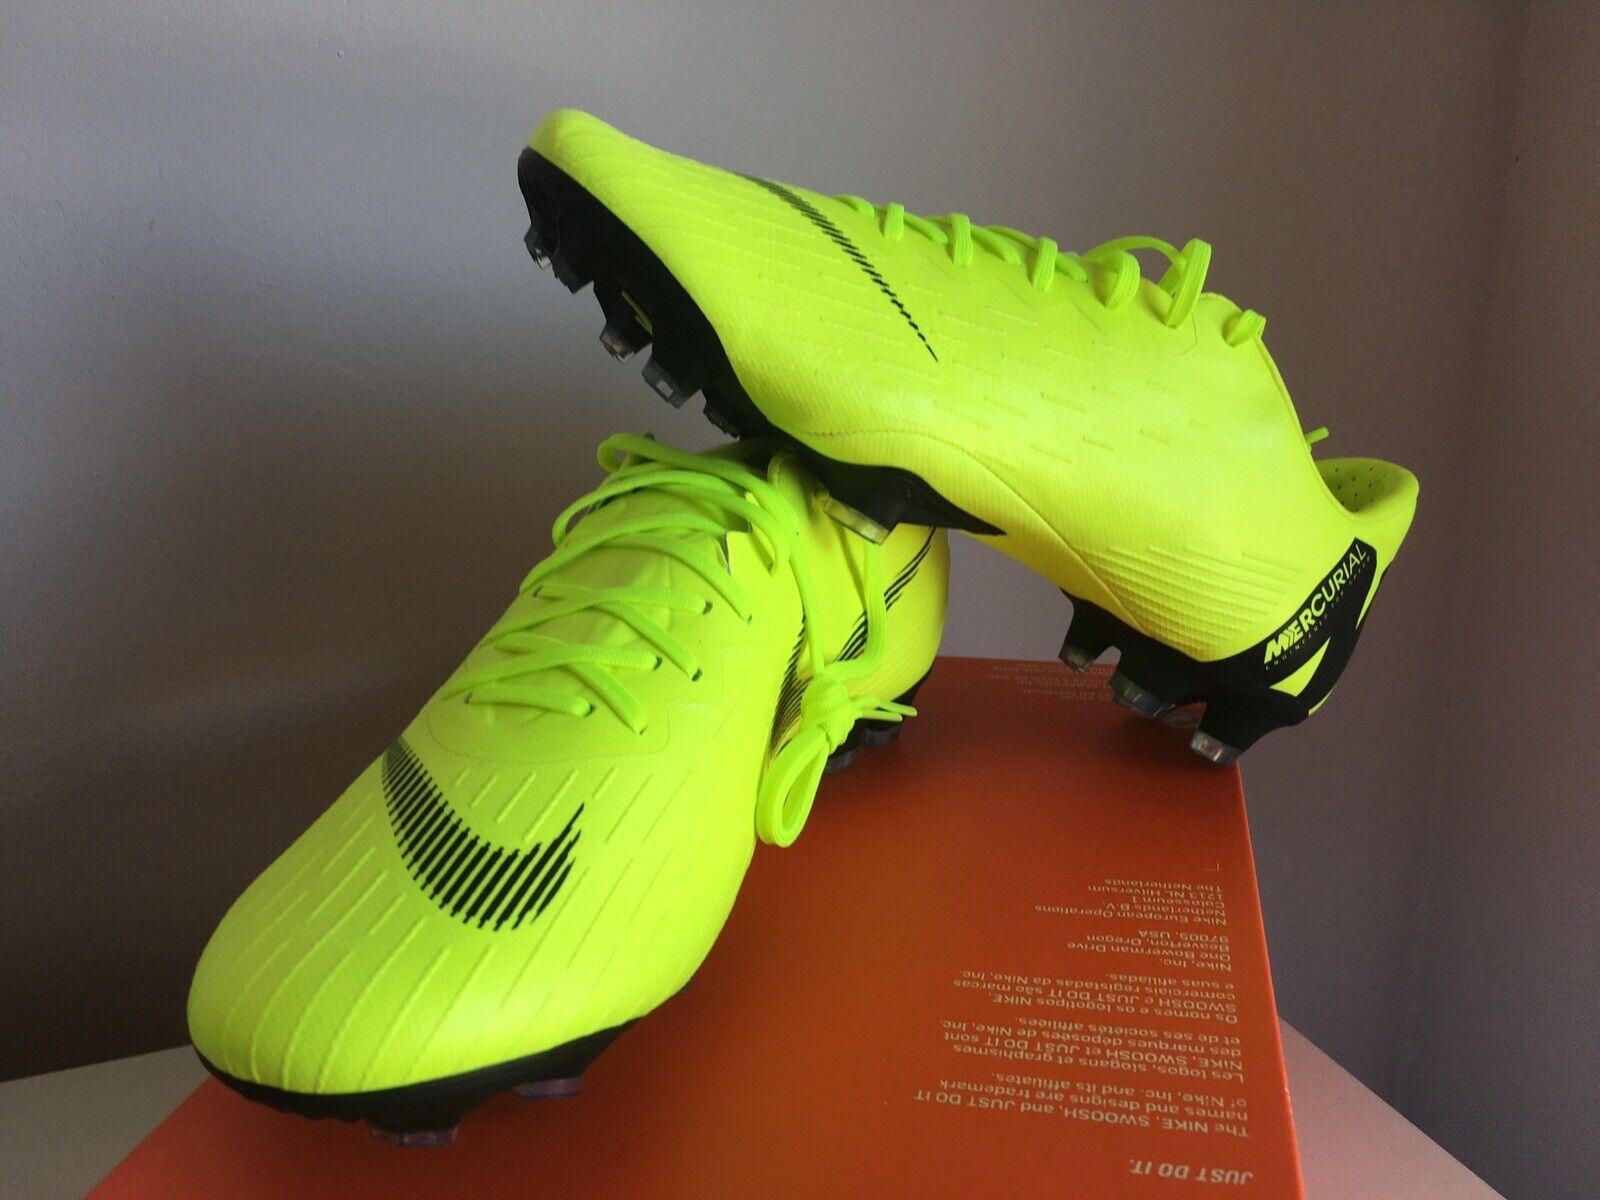 Nike mercurial vapor 12 pro FG Talla 43 8,5 us 9,5 nuevo